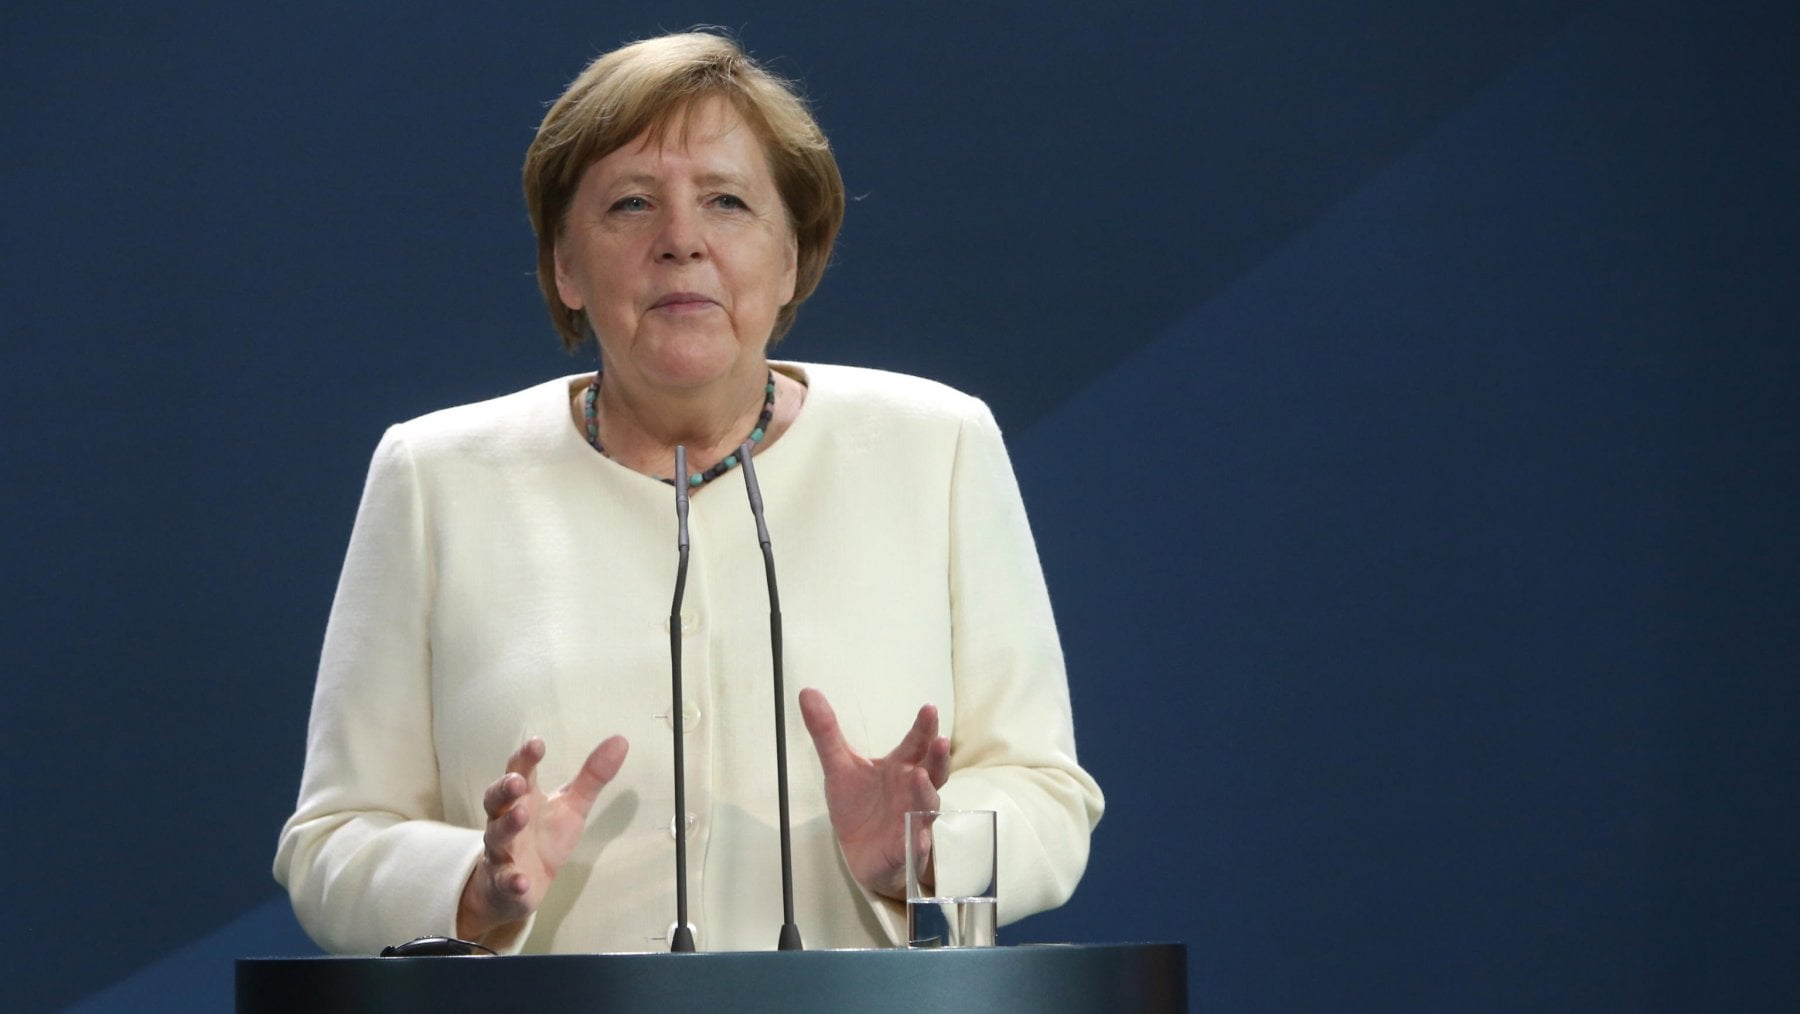 183816584 fe21801d 62f4 4471 8025 4f779bd89034 - La Danimarca aiutò gli Stati Uniti a spiare Angela Merkel